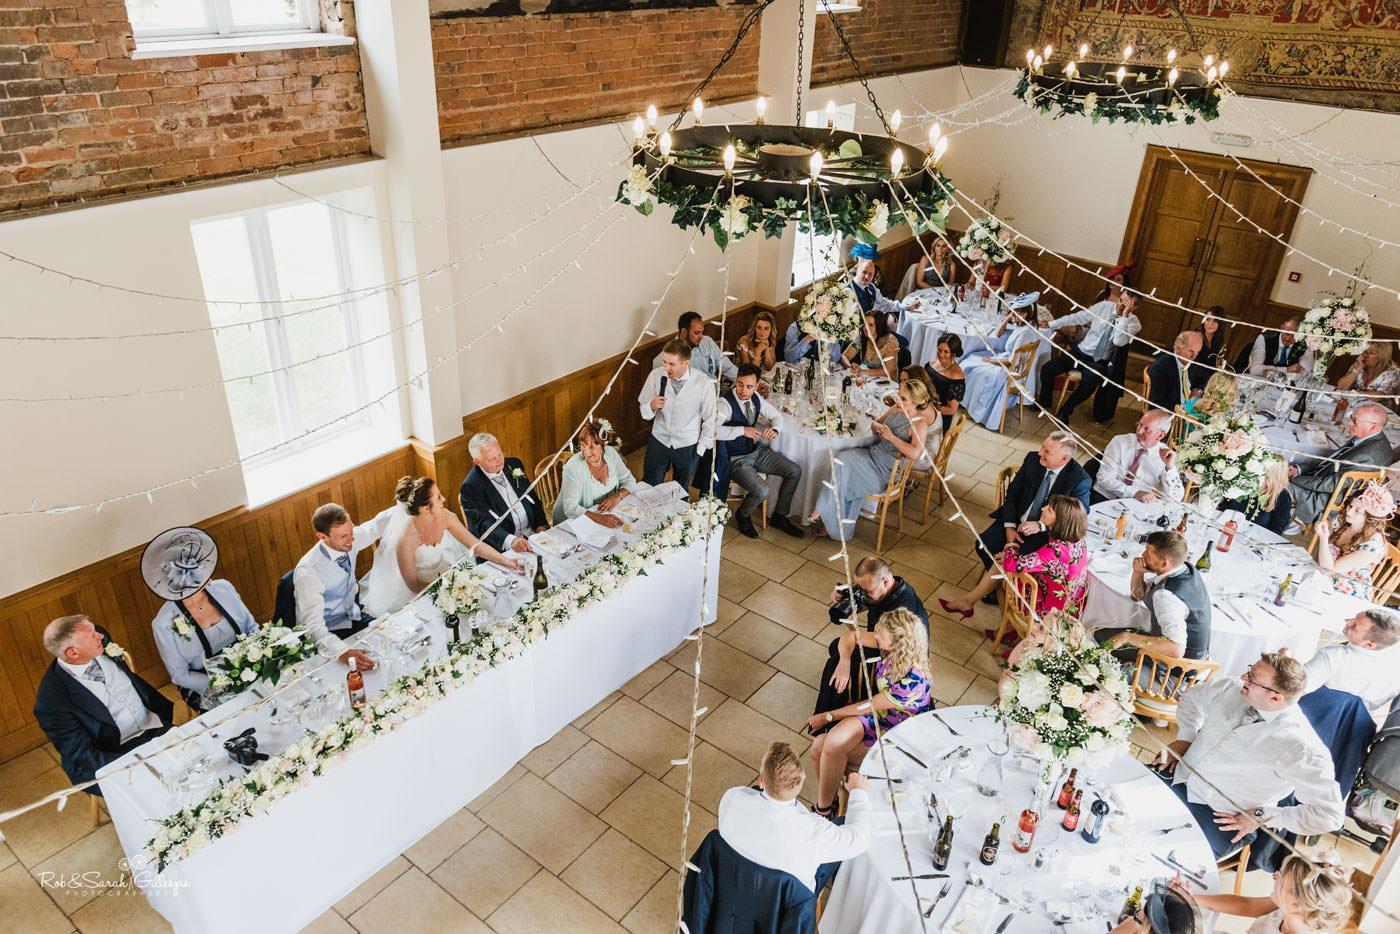 Wedding speeches at Delbury Hall in Shropshire